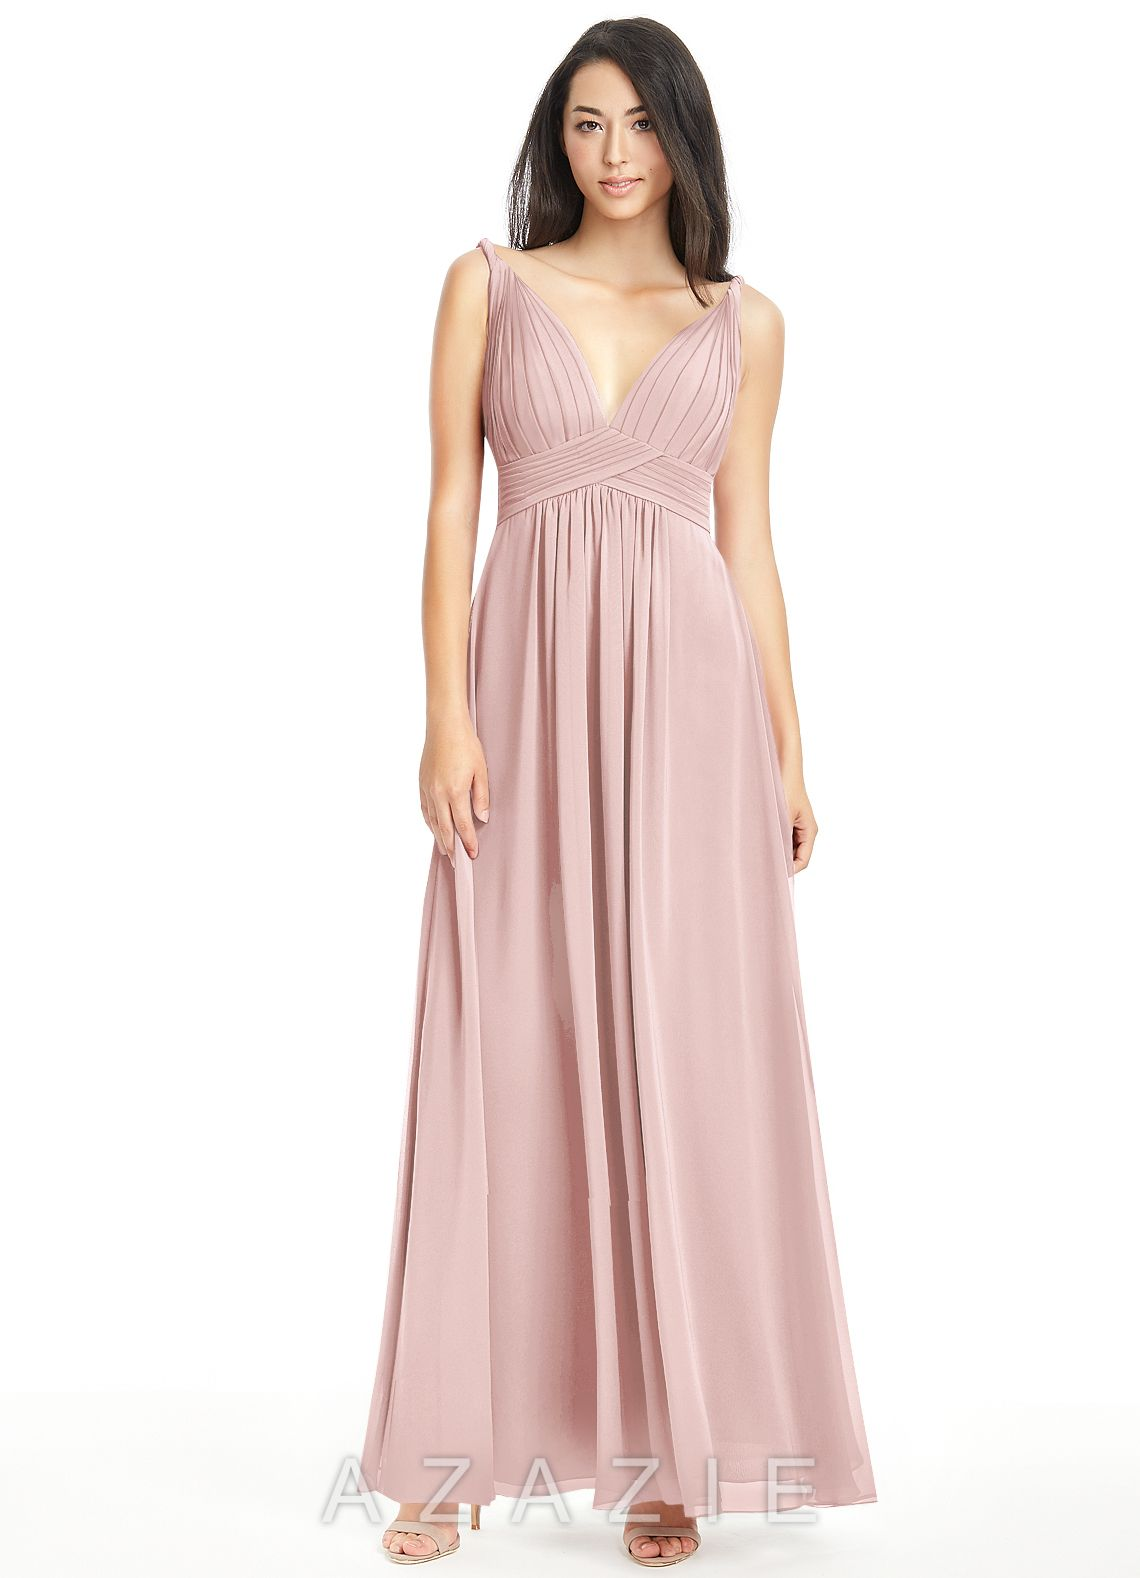 MAREN - Bridesmaid Dress | Dusty rose, Bridal parties and Wedding